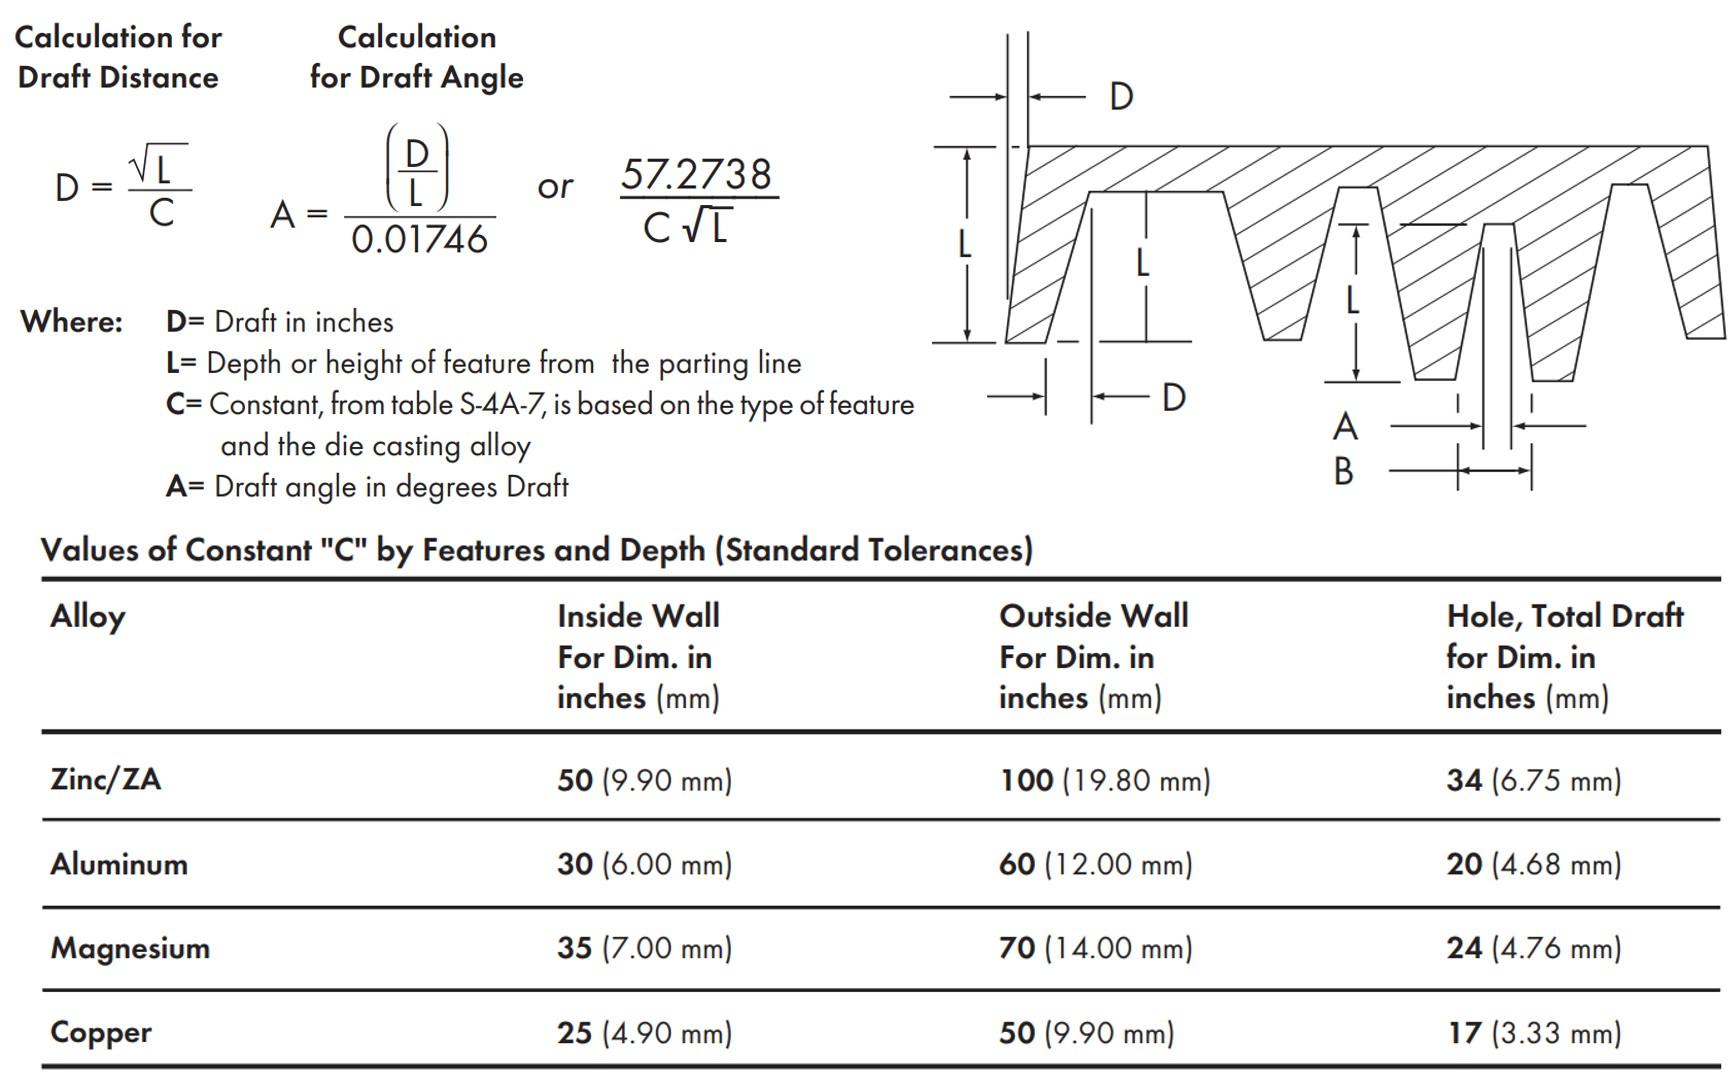 Equation for Calculating Standard Tolerances of Draft